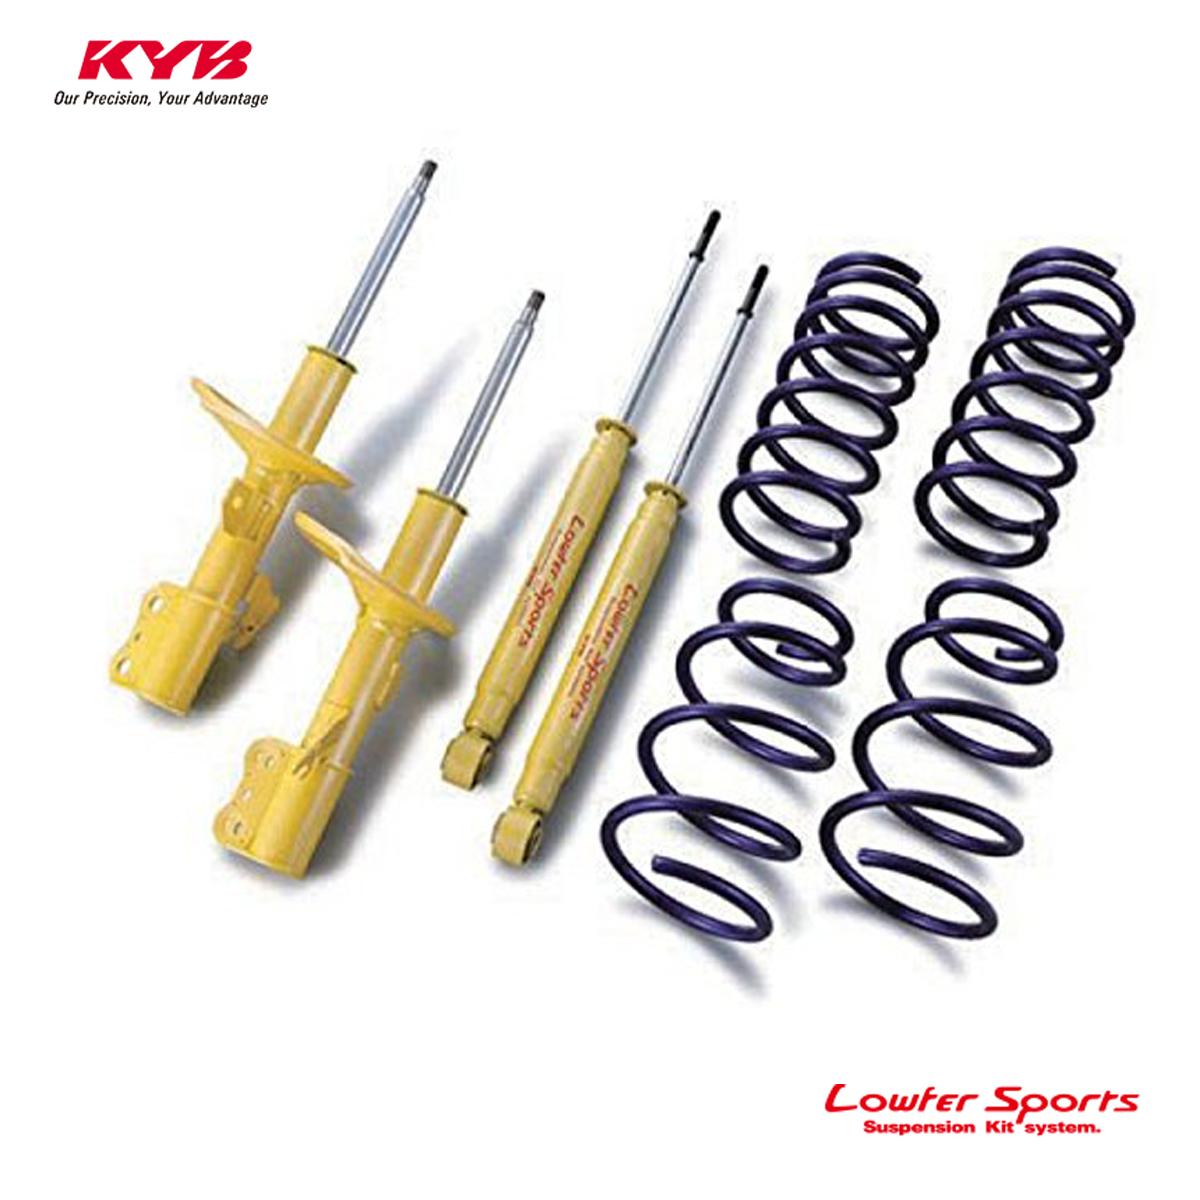 KYB カヤバ プリウス NHW20 ショックアブソーバー サスペンションキット Lowfer Sports LKIT-NHW2016 配送先条件有り